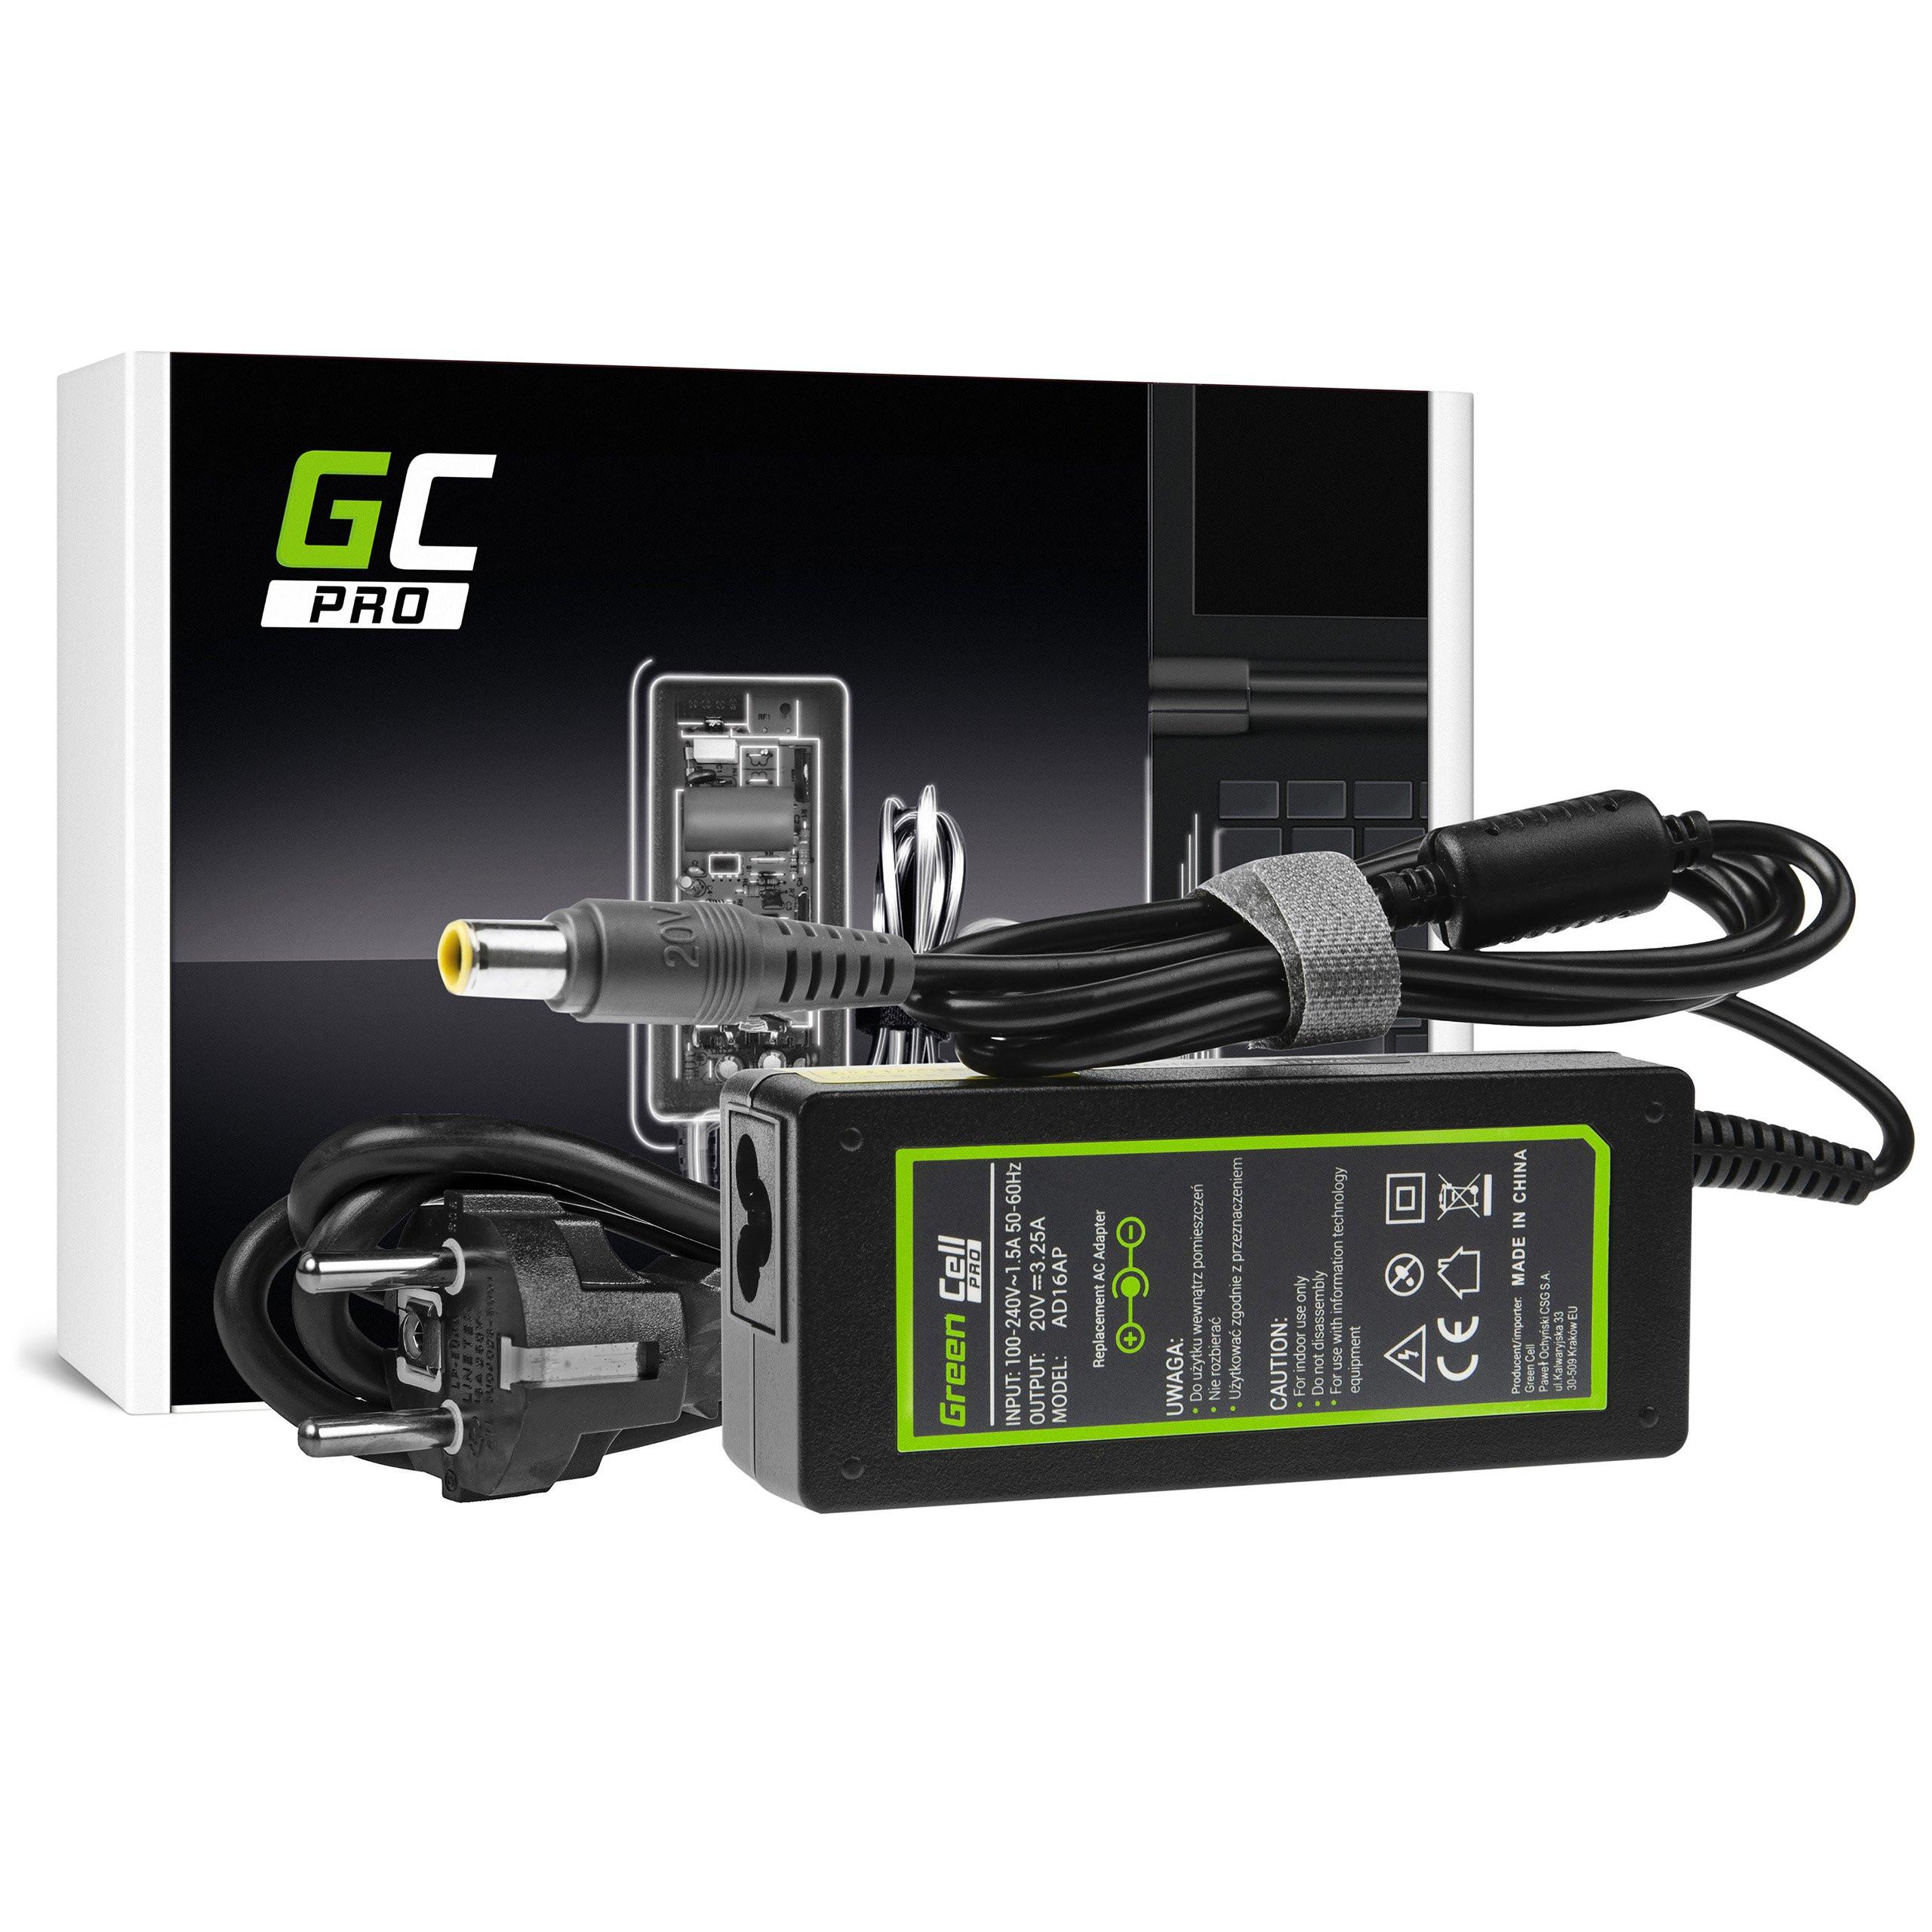 Zasilacz Ładowarka Green Cell PRO 20V 3.25A 65W do Lenovo B590 ThinkPad R61 R500 T430 T430s T510 T520 T530 X200 X201 X220 X230